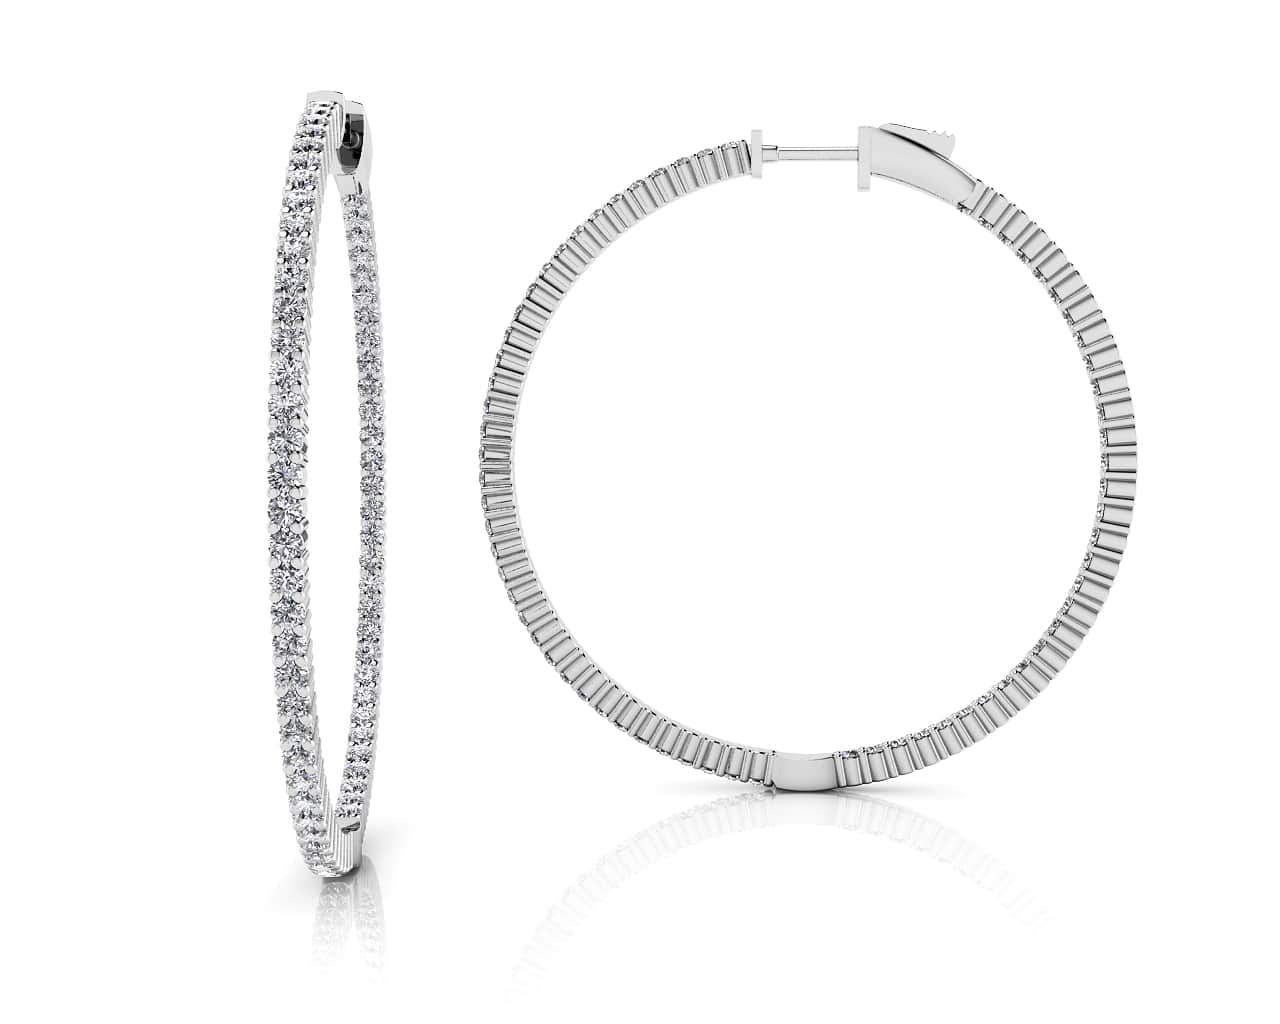 5e31d9405eb650 Single Row Inside Out Diamond Hoop Earring Medium In 14K 18K Or Platinum